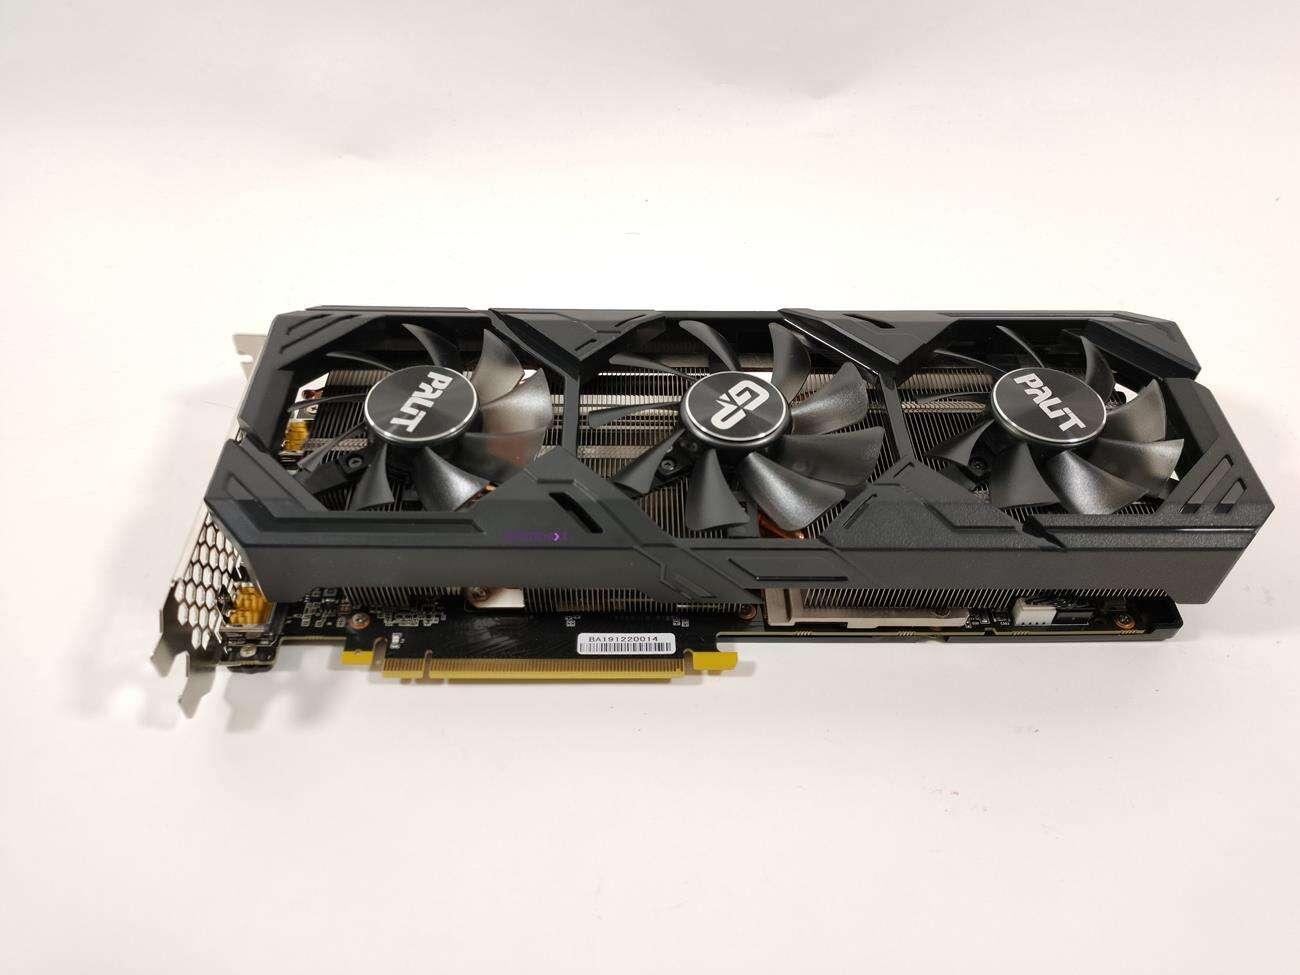 test Palit GeForce RTX 2070 SUPER GP Premium, recenzja Palit GeForce RTX 2070 SUPER GP Premium, review Palit GeForce RTX 2070 SUPER GP Premium, opinia Palit GeForce RTX 2070 SUPER GP Premium,c ena Palit GeForce RTX 2070 SUPER GP Premium